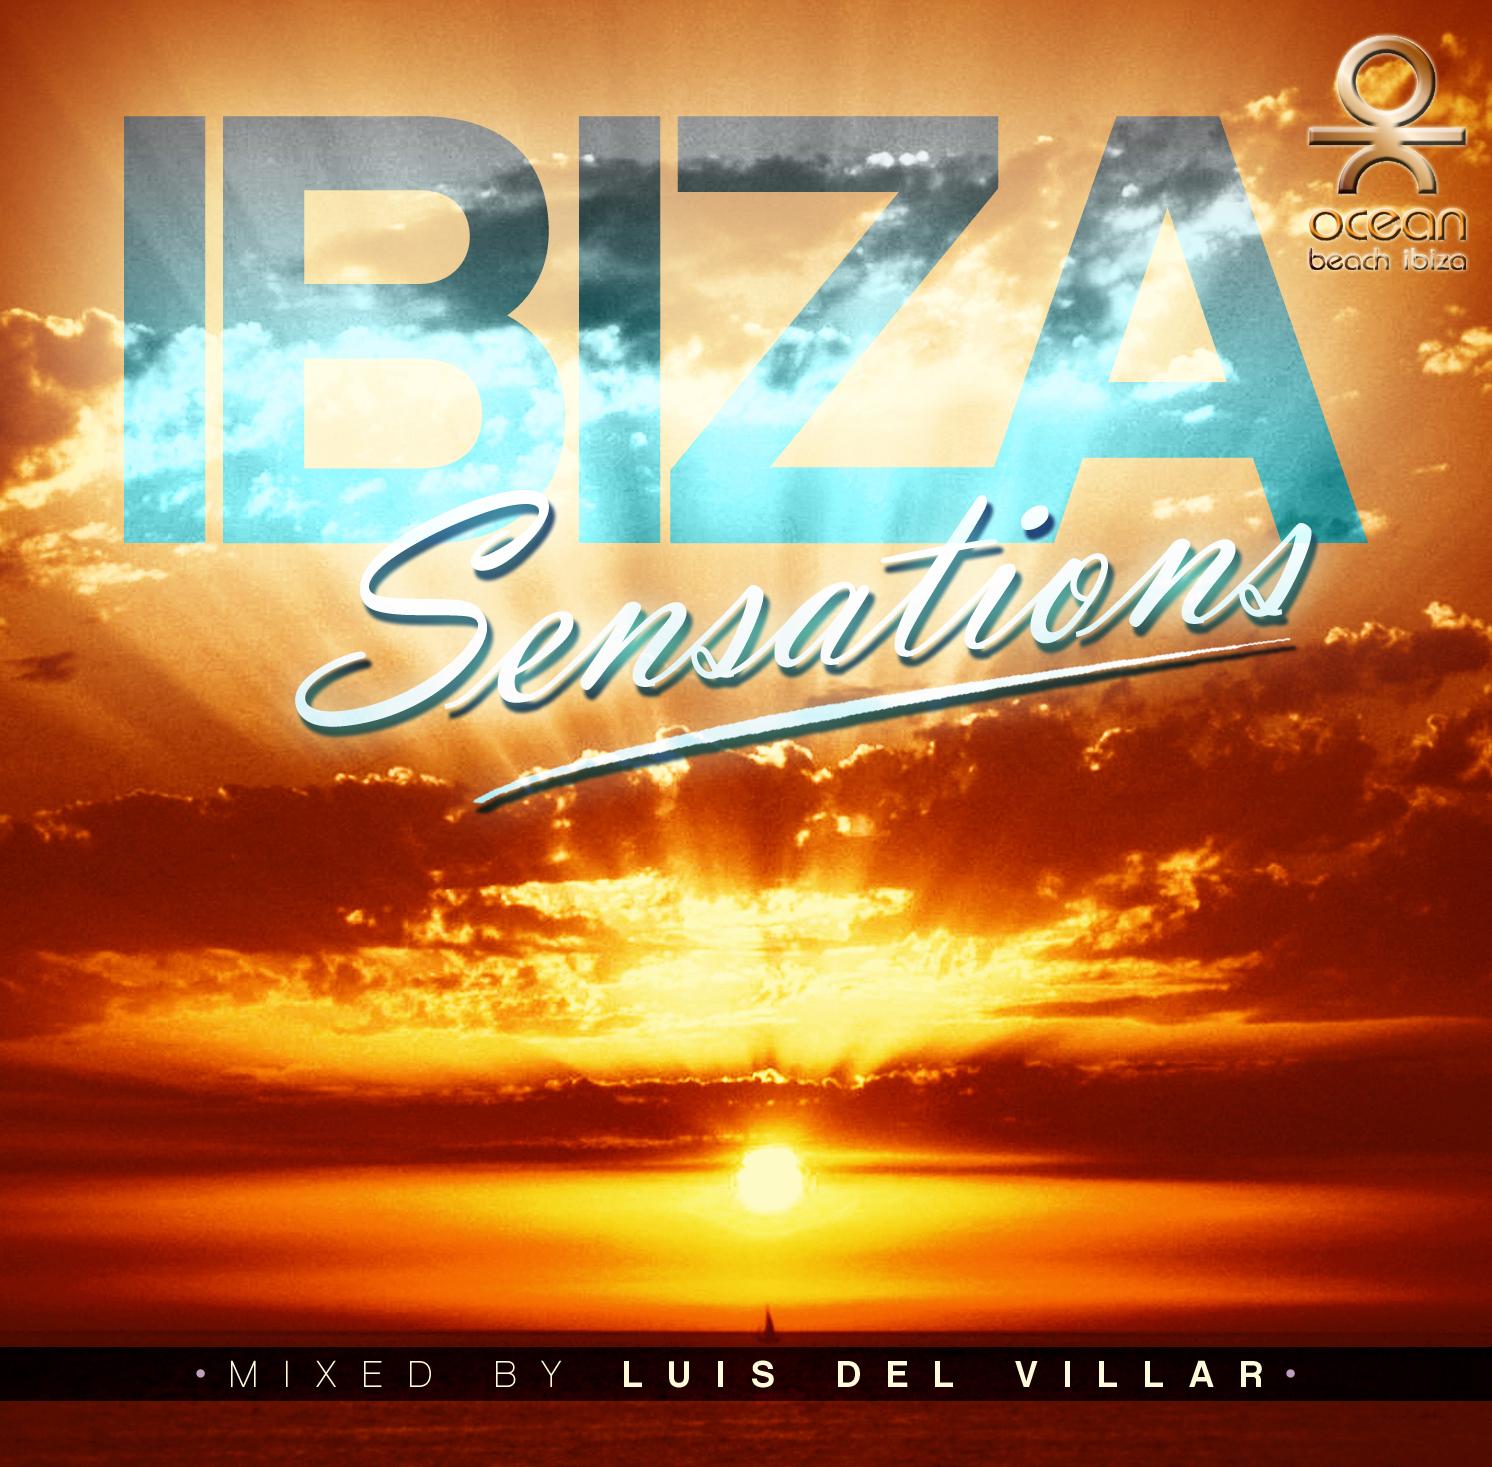 Artwork for Ibiza Sensations 146 @ Blue Bar Beach Club Calella (Barcelona)